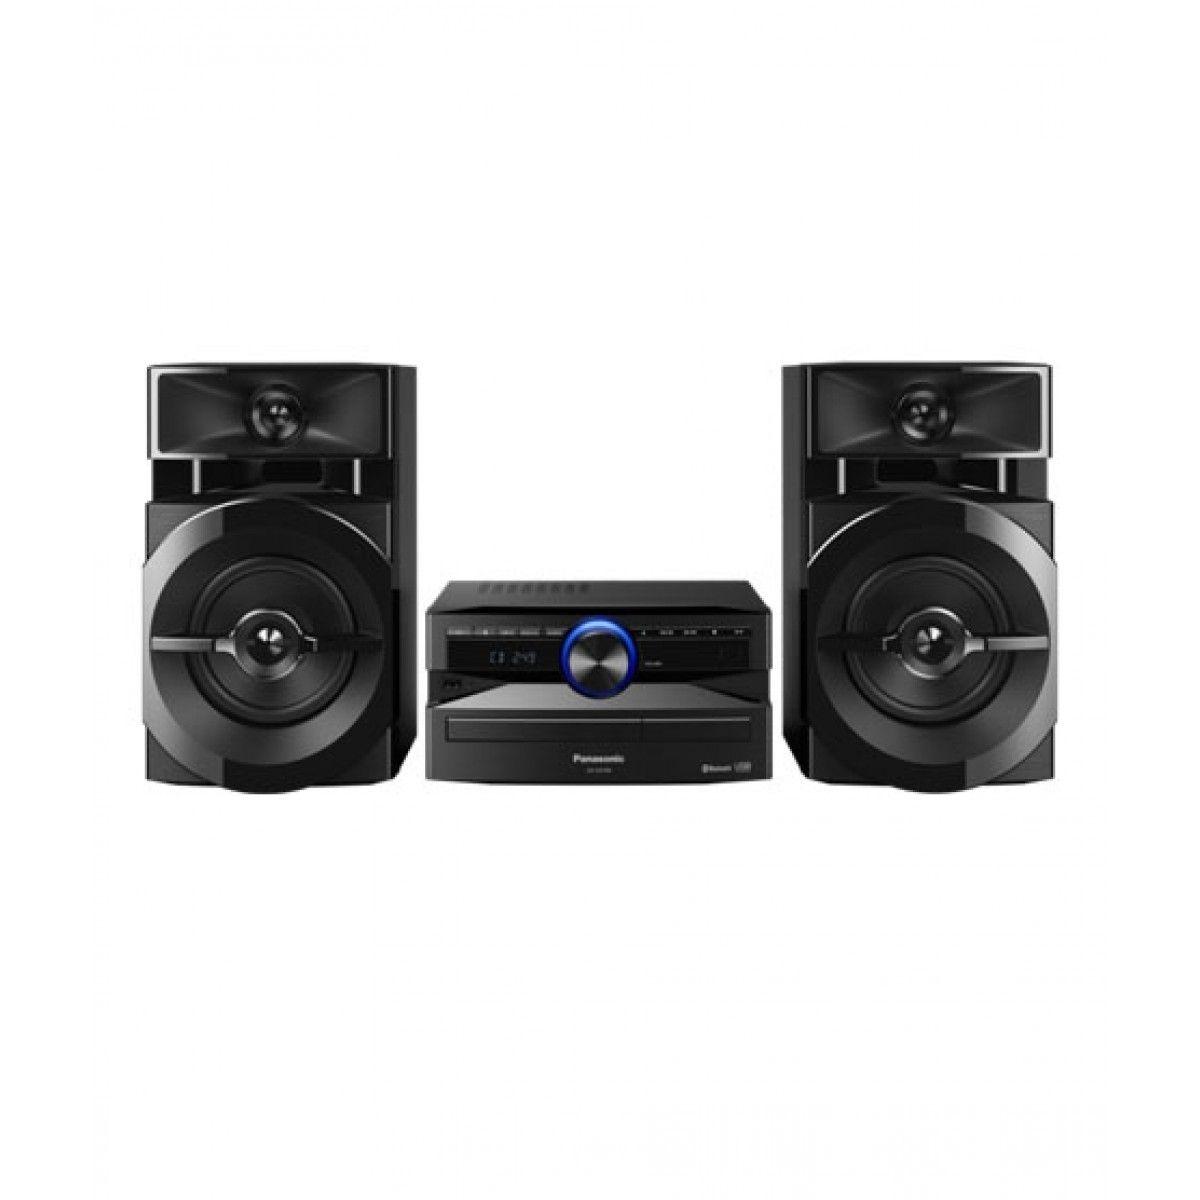 Panasonic SC-UX100 2.1 Channel Mini Sound System